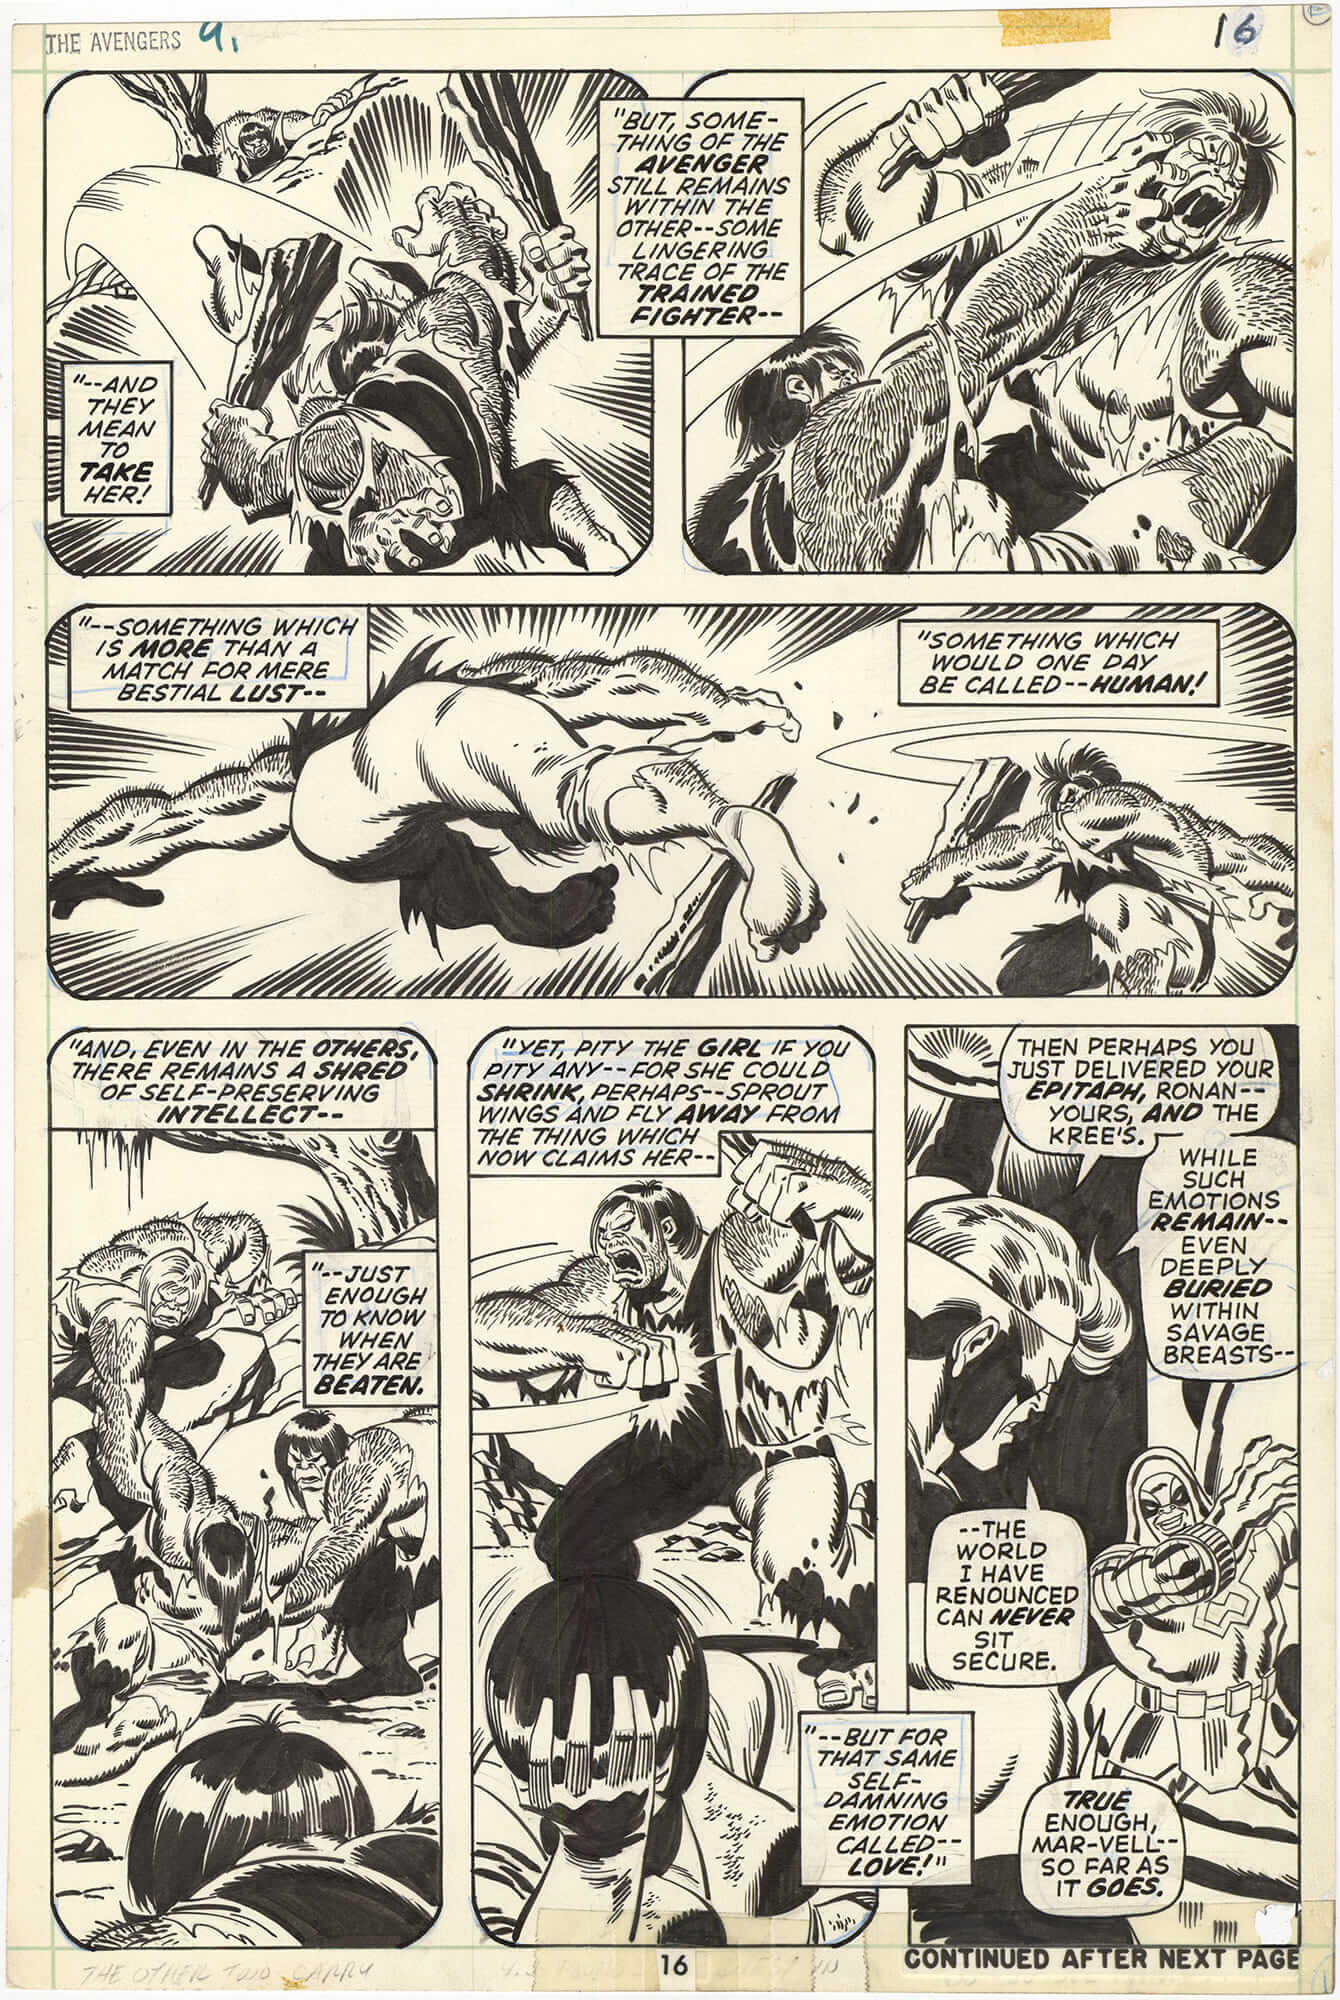 Avengers #91 p16